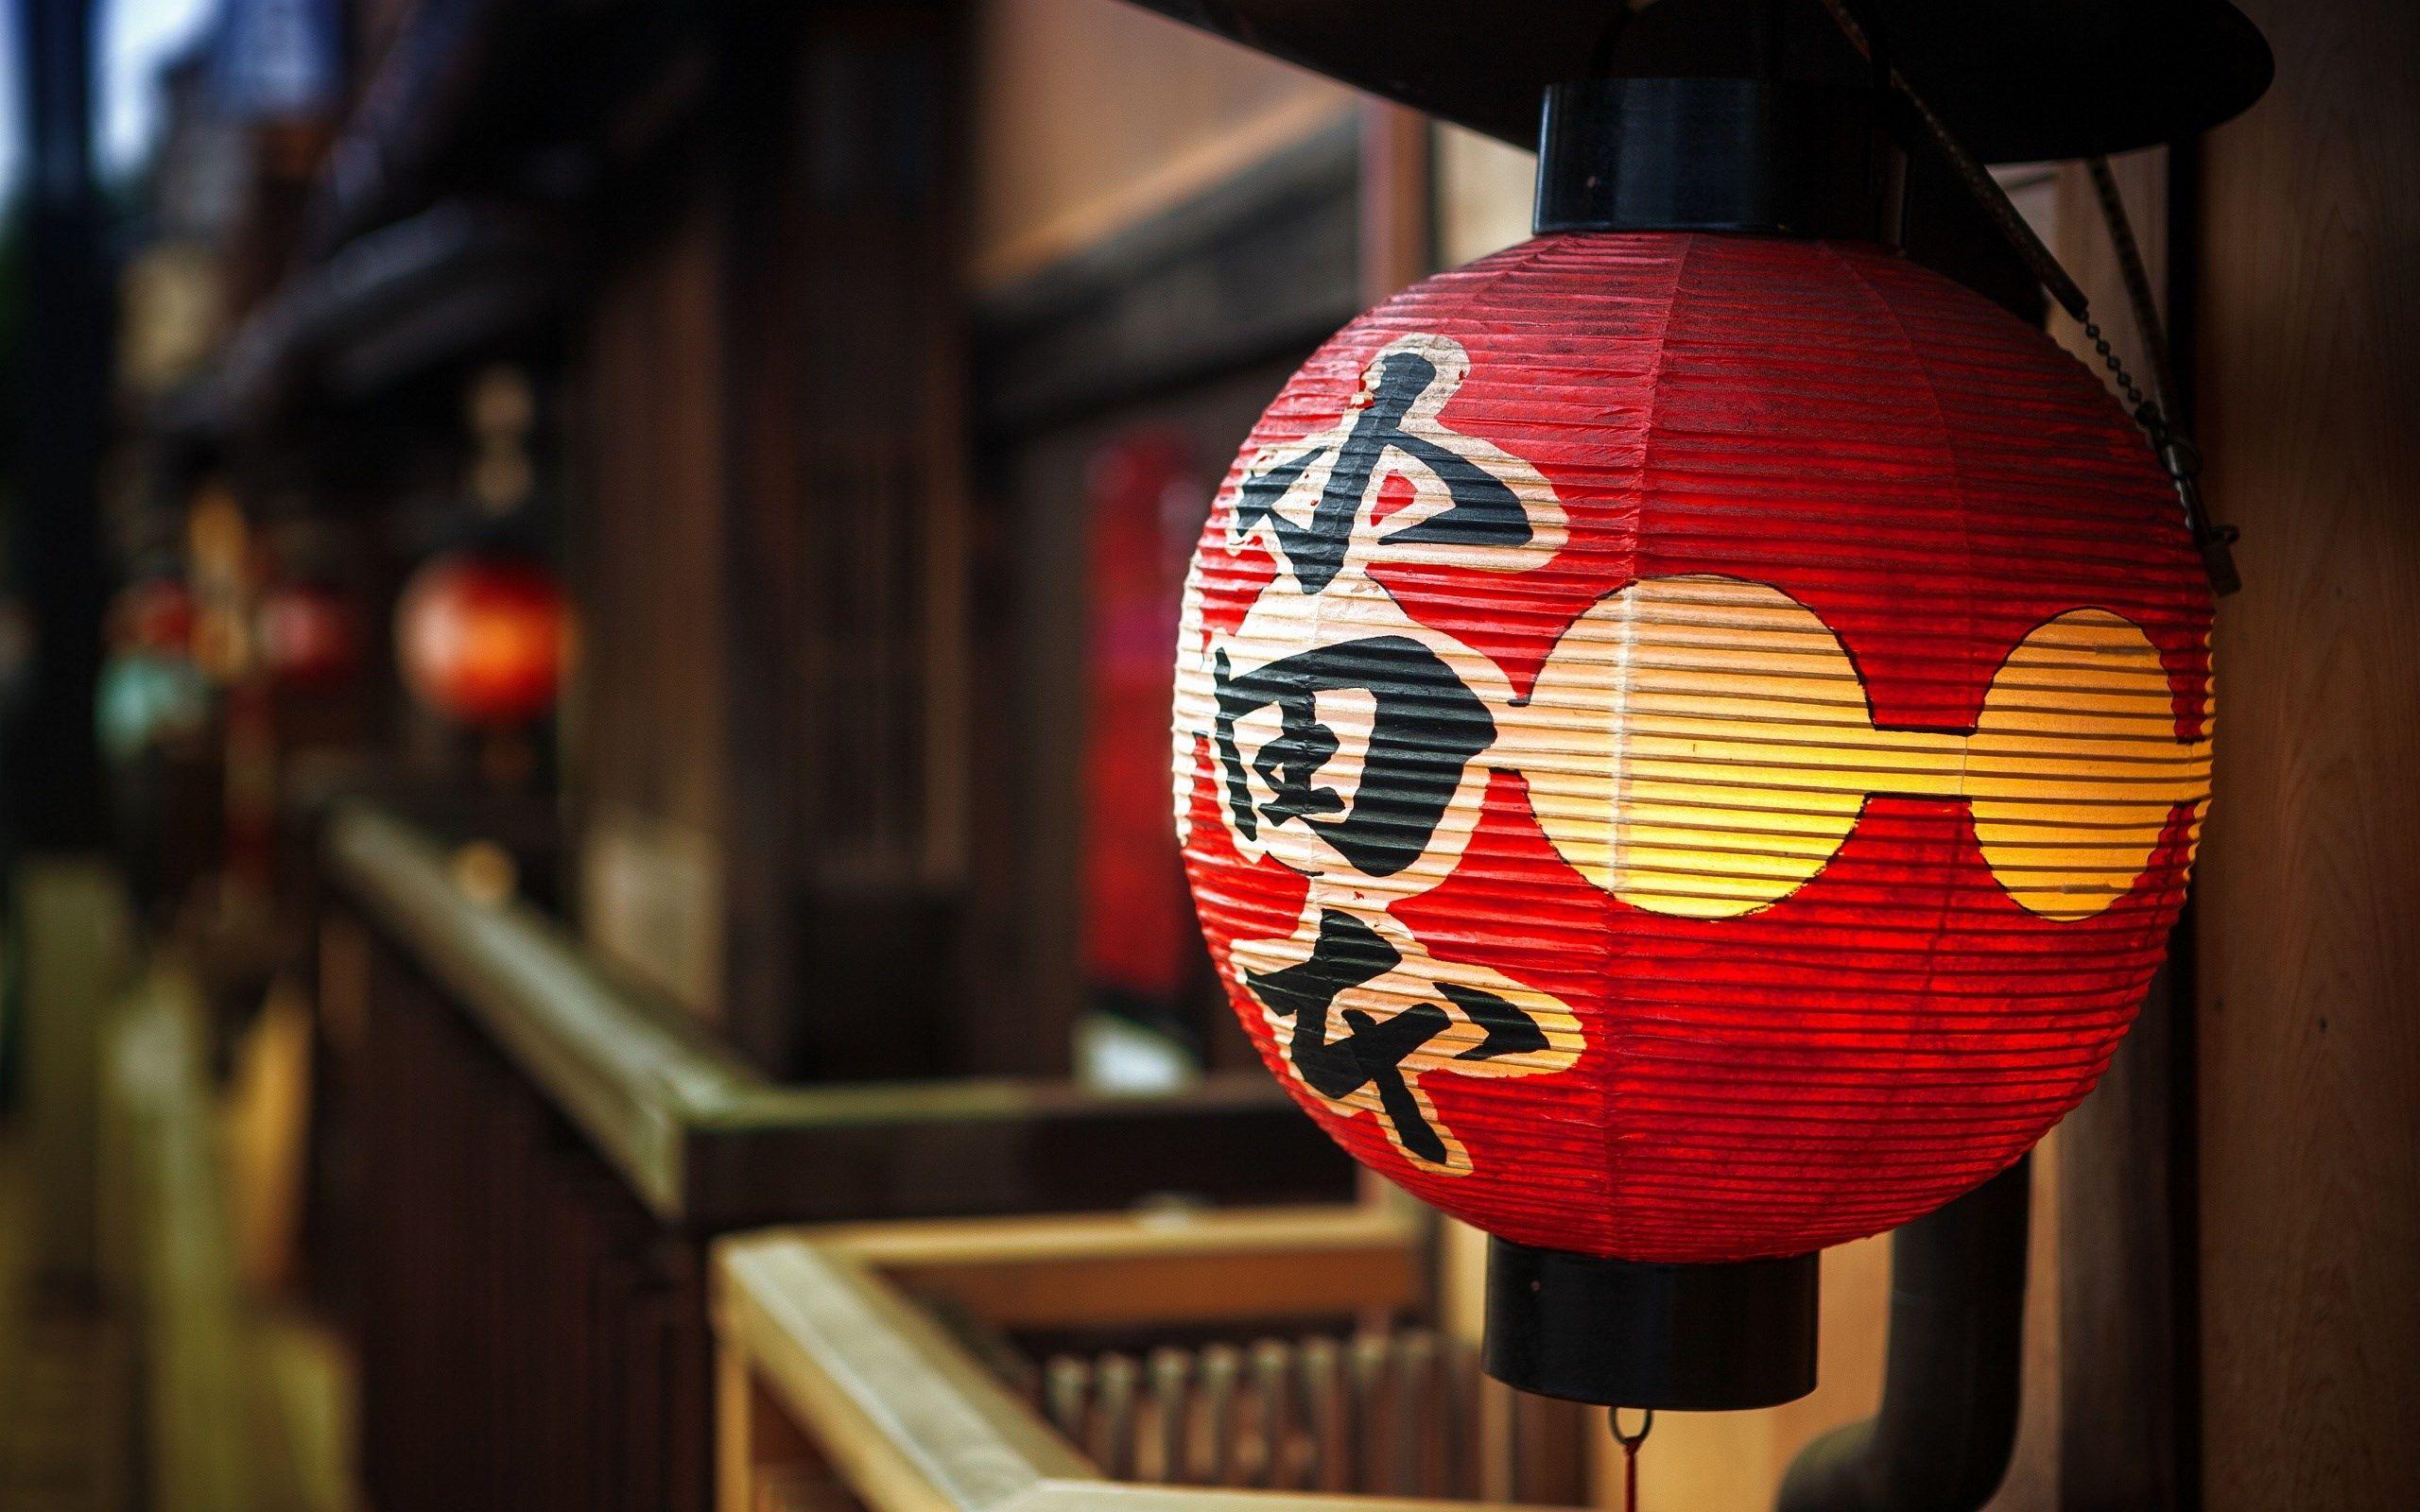 Japanese Paper Lantern HD Wallpaper | Wallpapers | Pinterest ... for Japanese Paper Lantern Wallpaper  155sfw